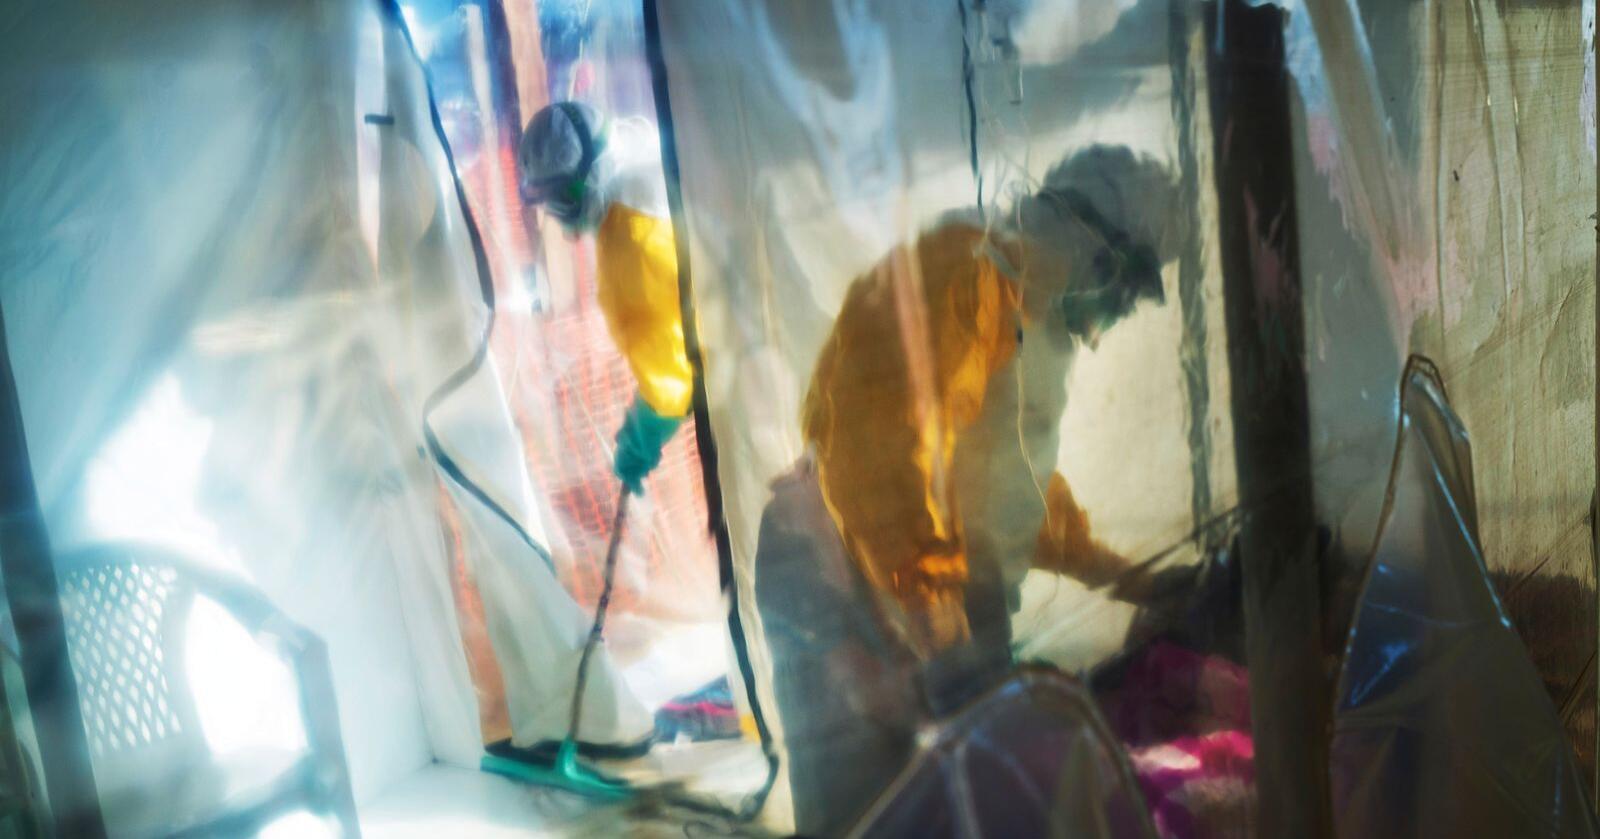 Helsearbeidere pleier en ebolasmittet person i Beni i Kongo. Bildet er tatt i juli i fjor. Foto: Jerome Delay / AP / NTB scanpix